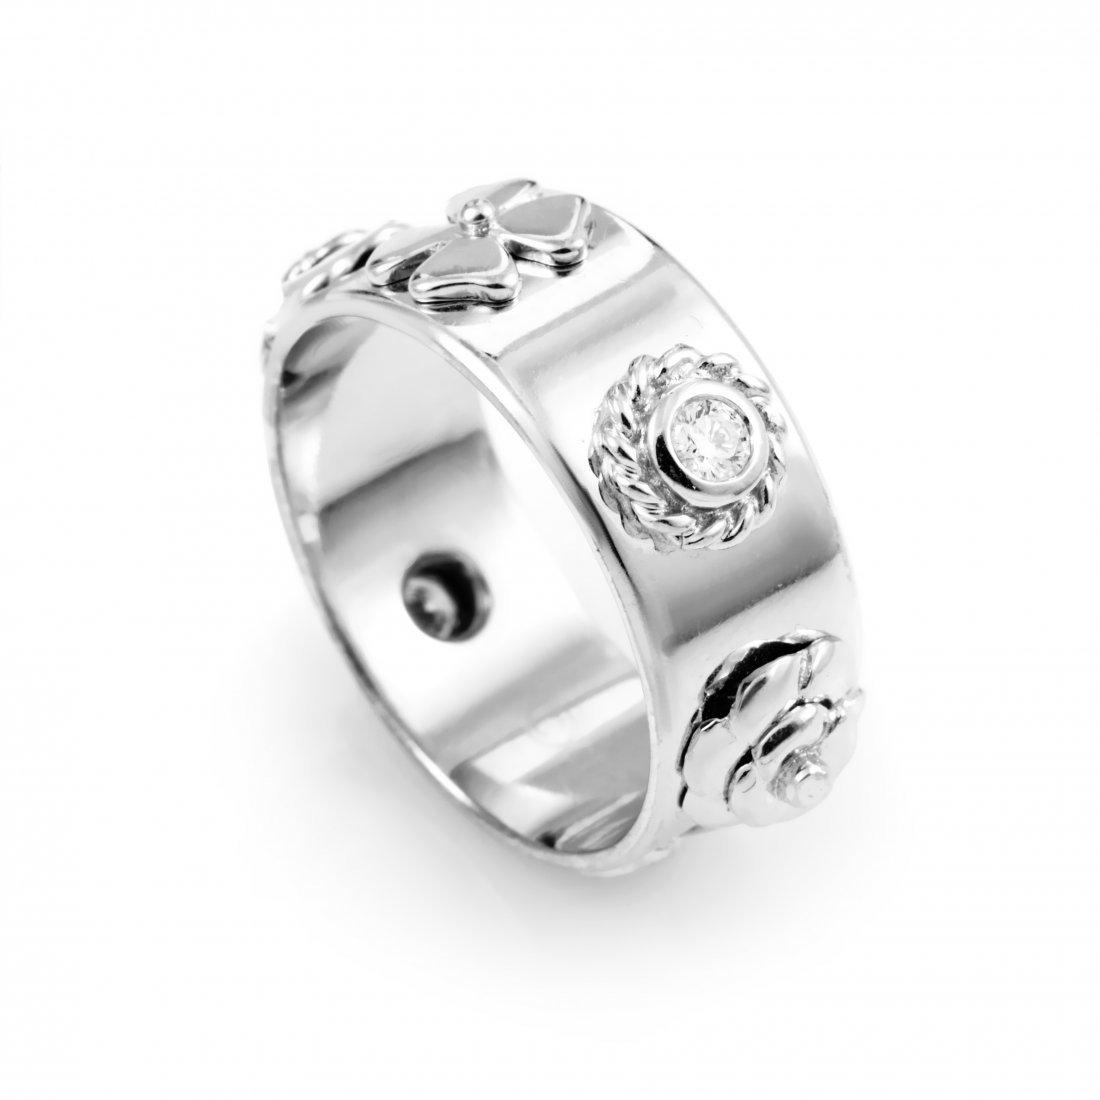 Chanel: Chanel Camélia 18K White Gold Diamond Band Ring